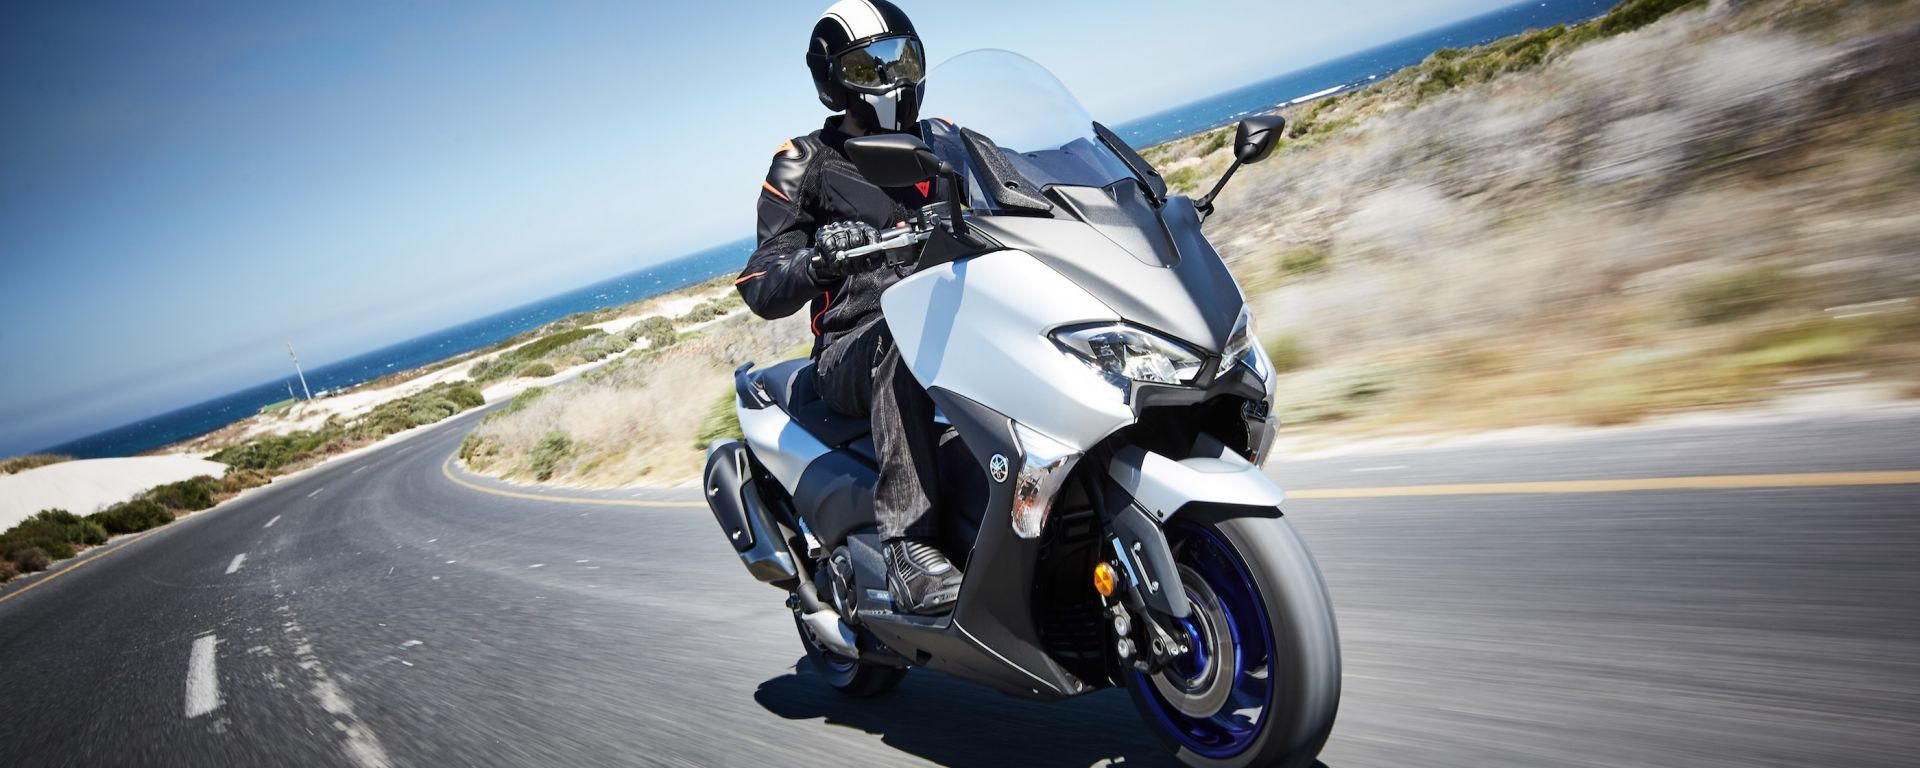 Yamaha TMAX 2017: prova, caratteristiche, prezzi